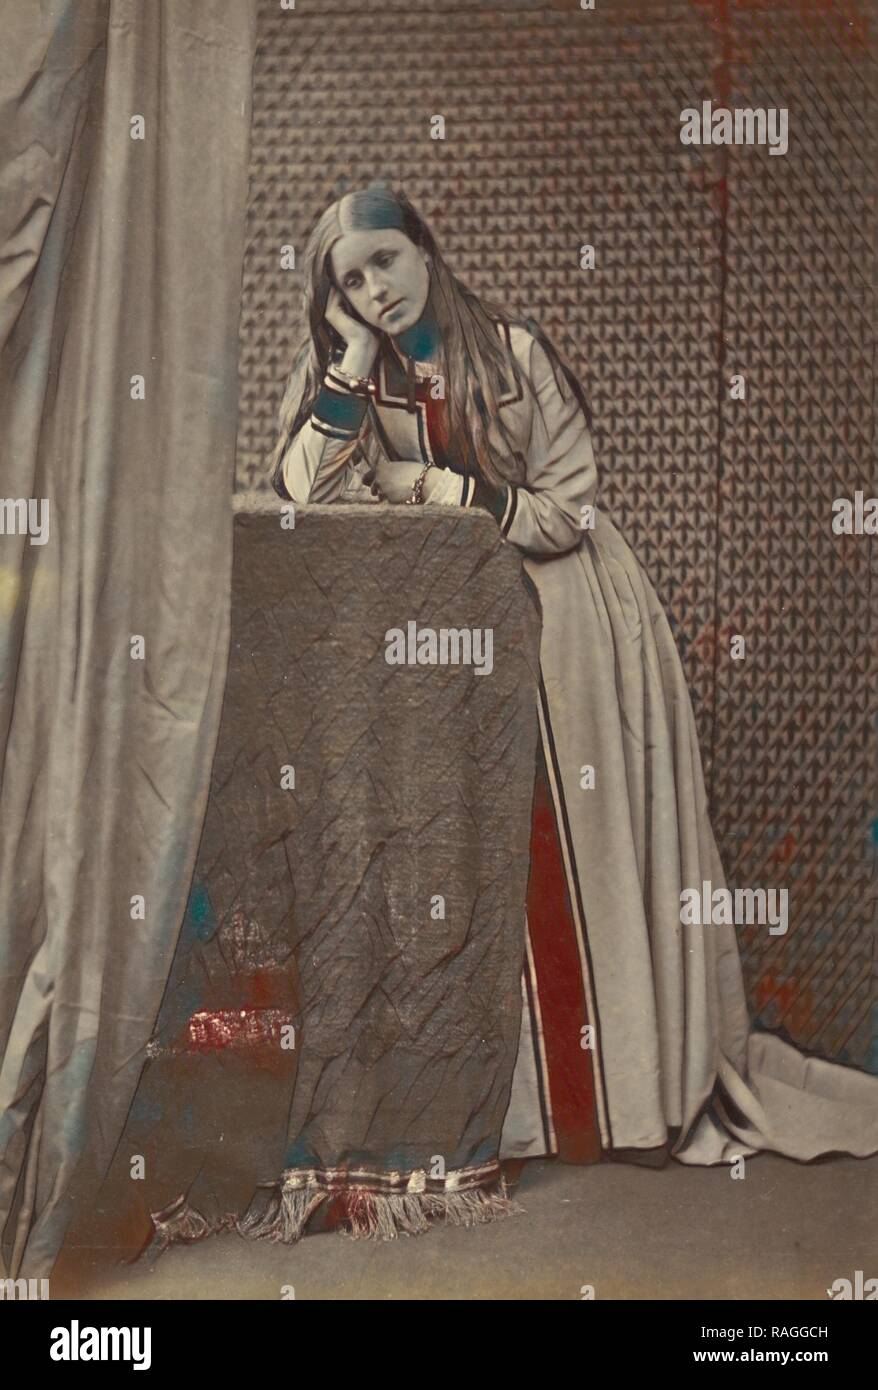 Frohe Weihnachten Miss Kingsley.Mrs Stuart Stock Photos Mrs Stuart Stock Images Alamy